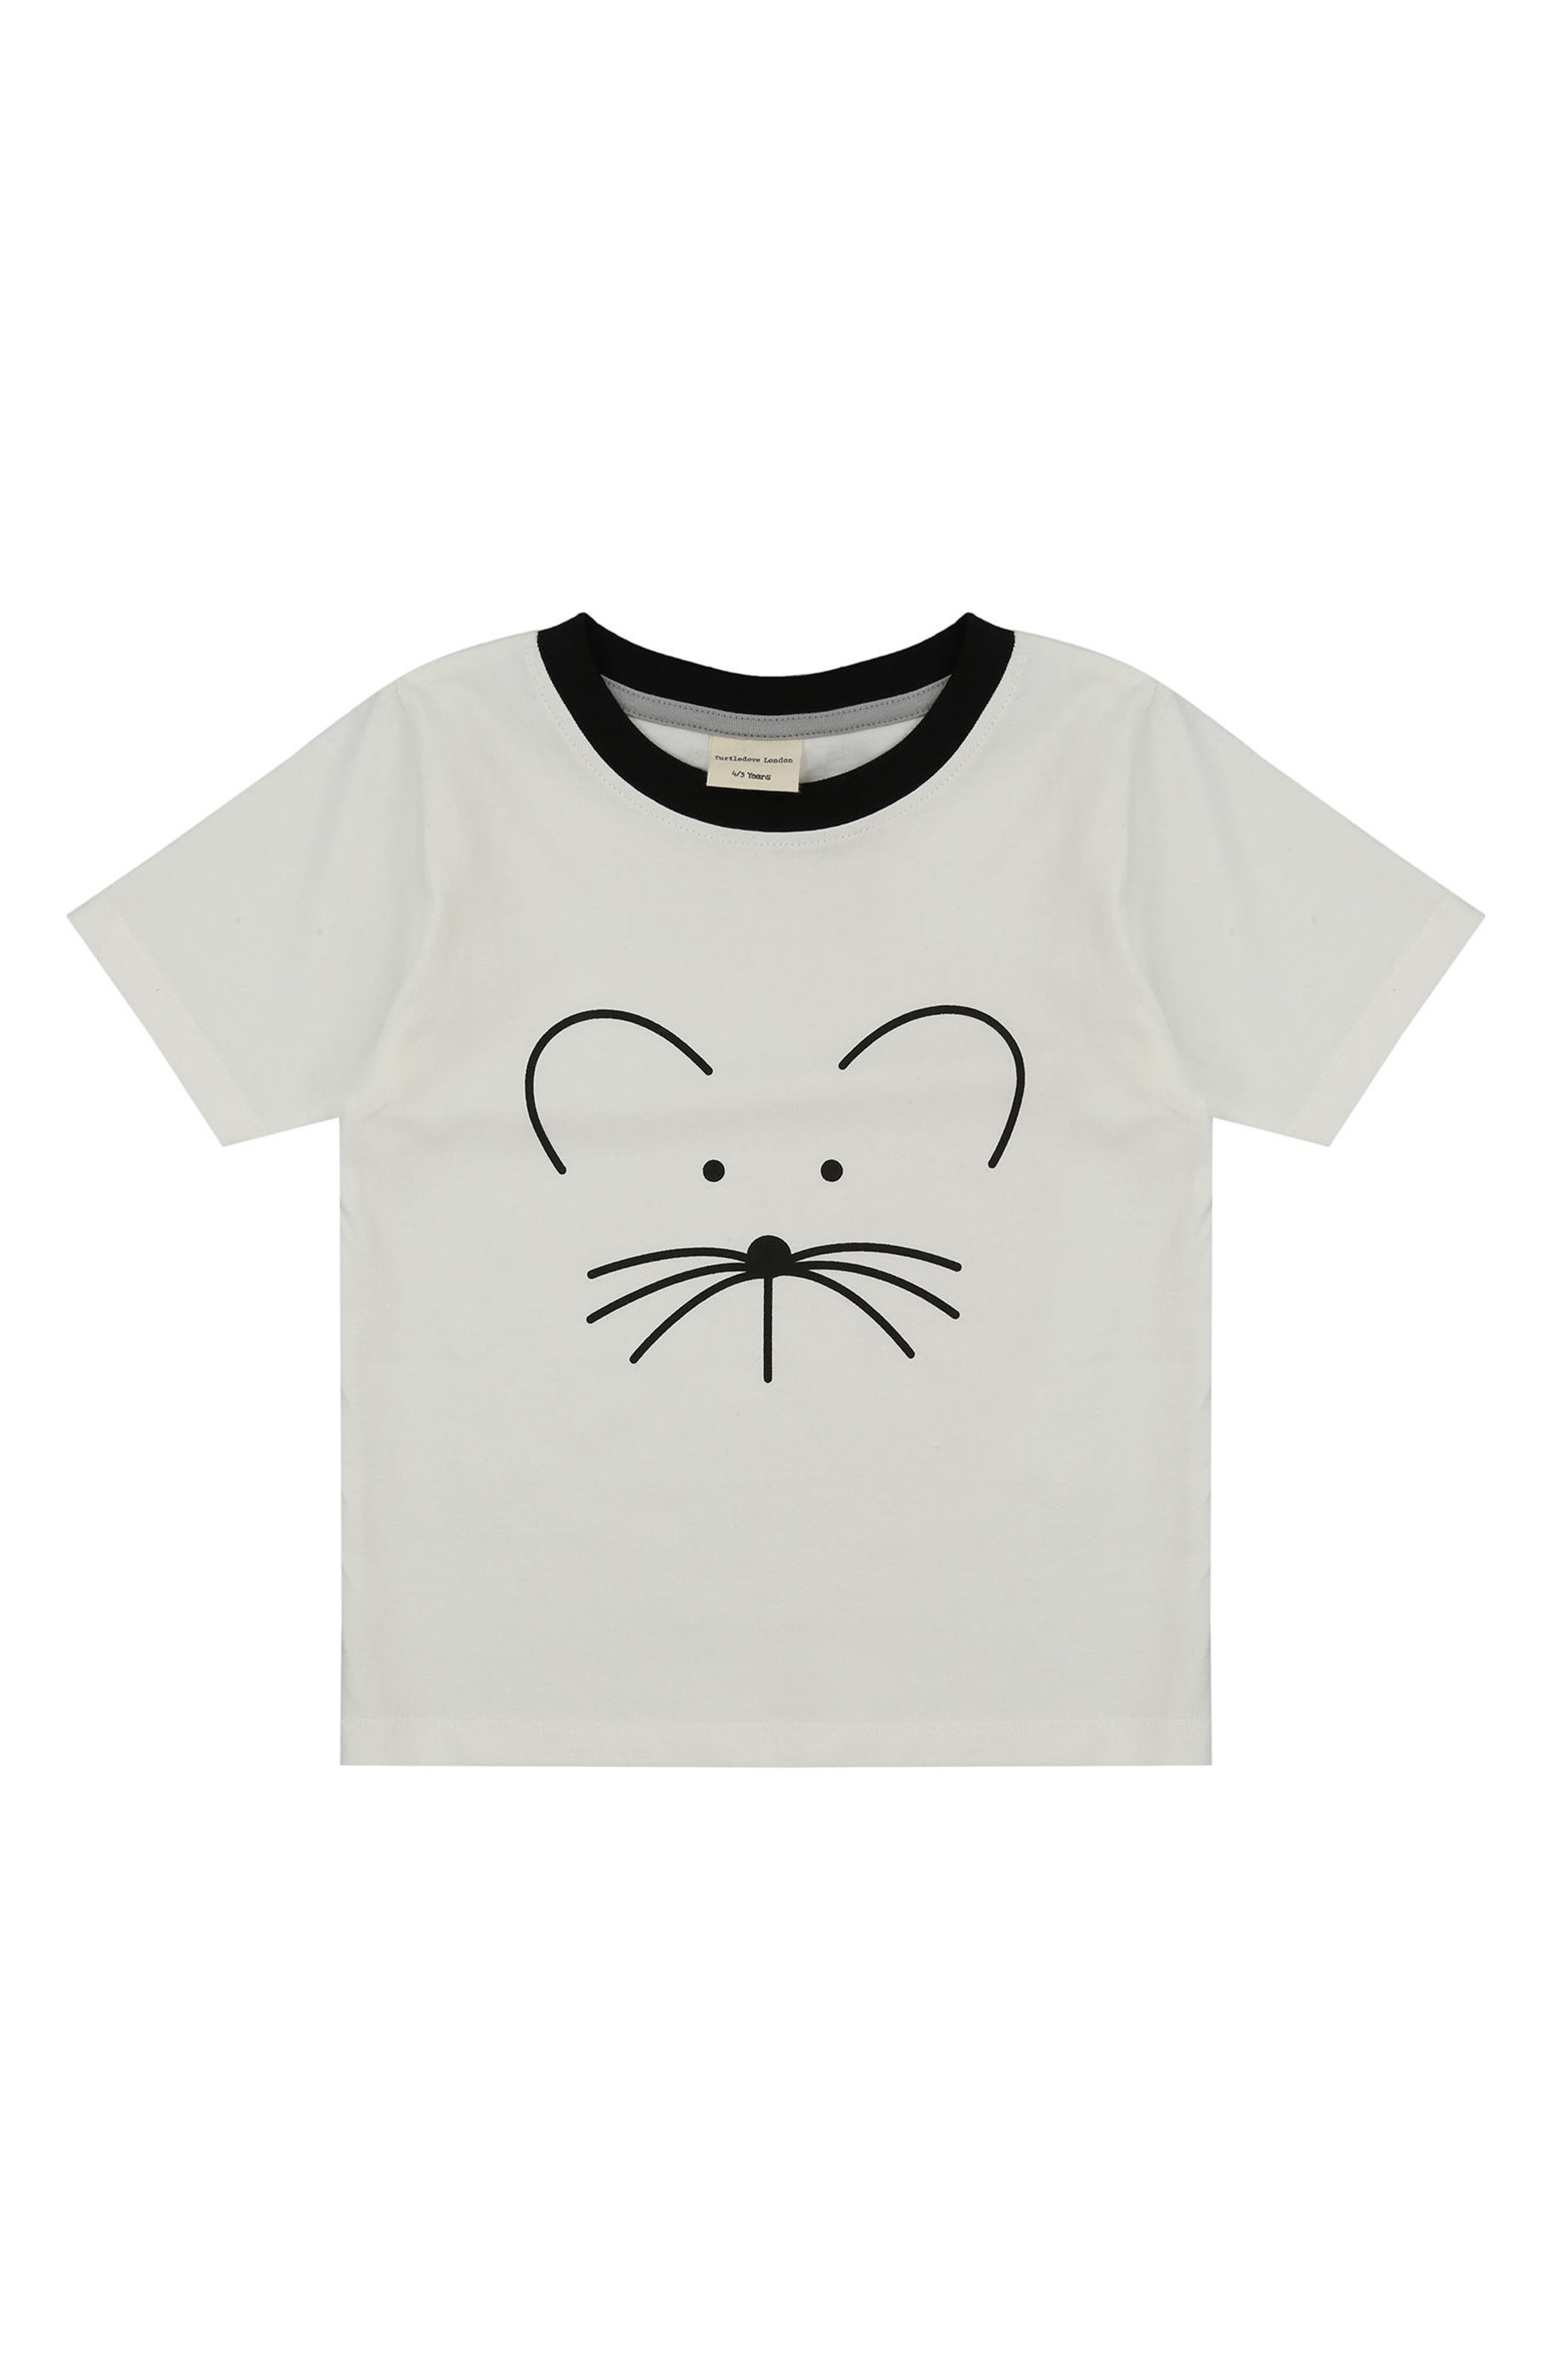 TURTLEDOVE LONDON Goodbye Mousey Organic Cotton T-Shirt, Main, color, 100